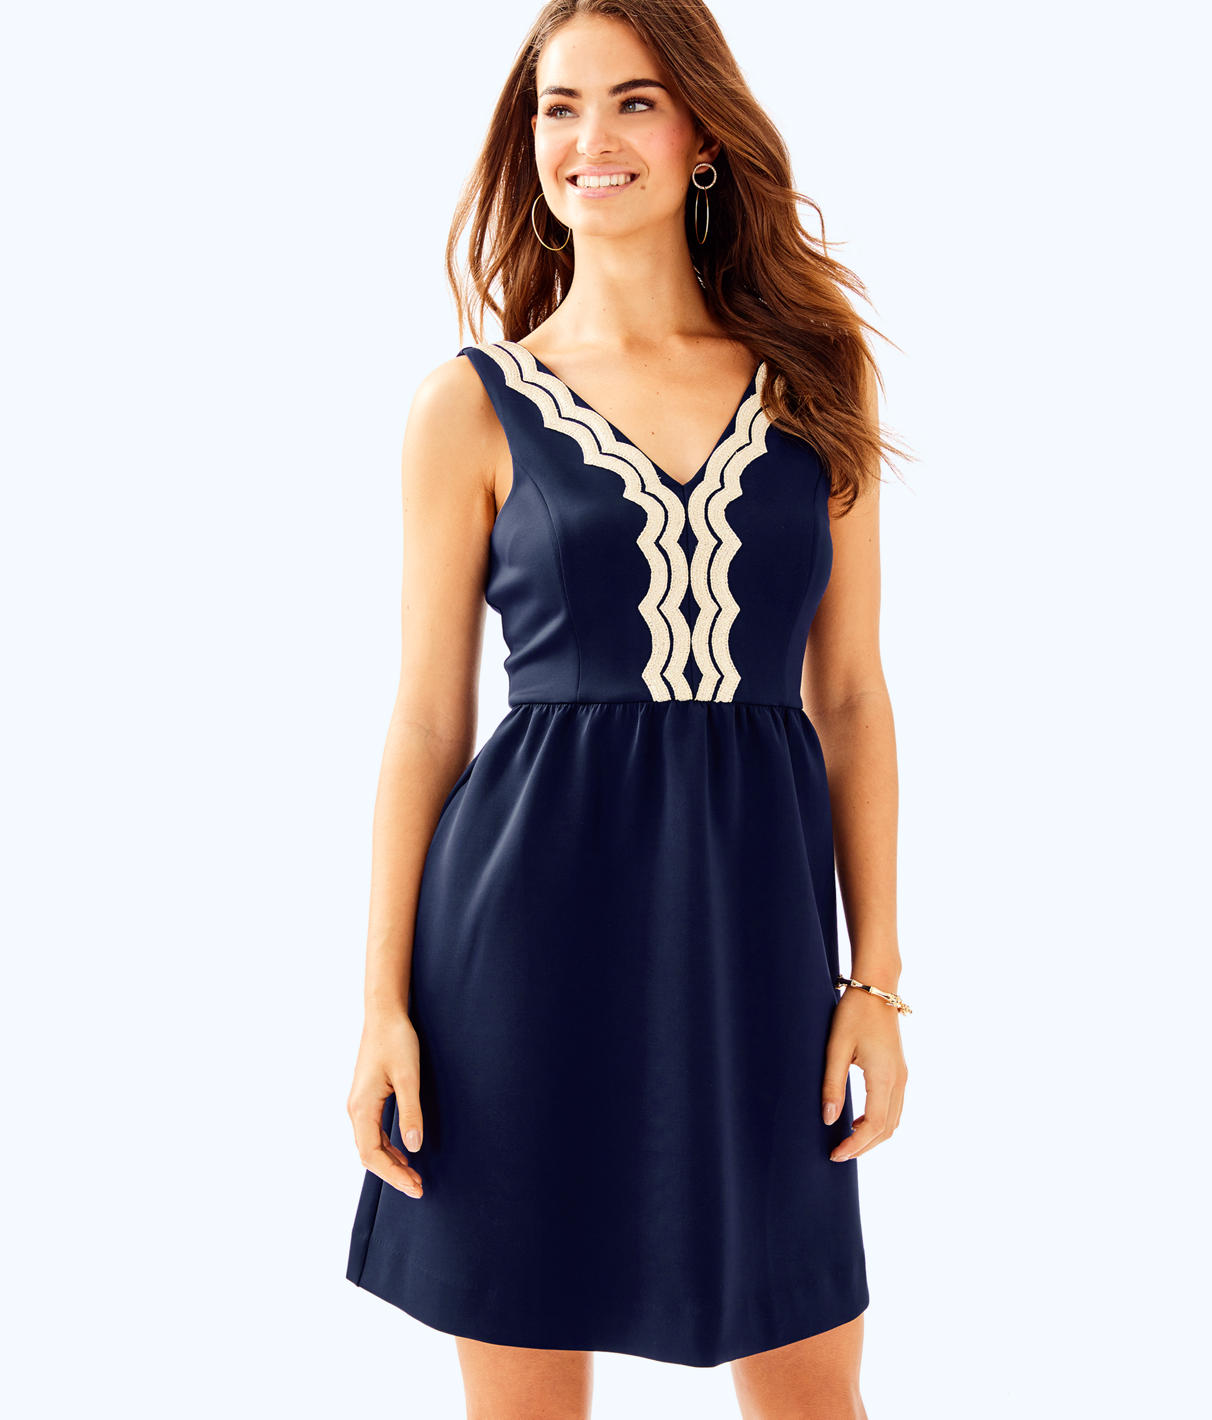 Lilly Pulitzer Rorey Dress